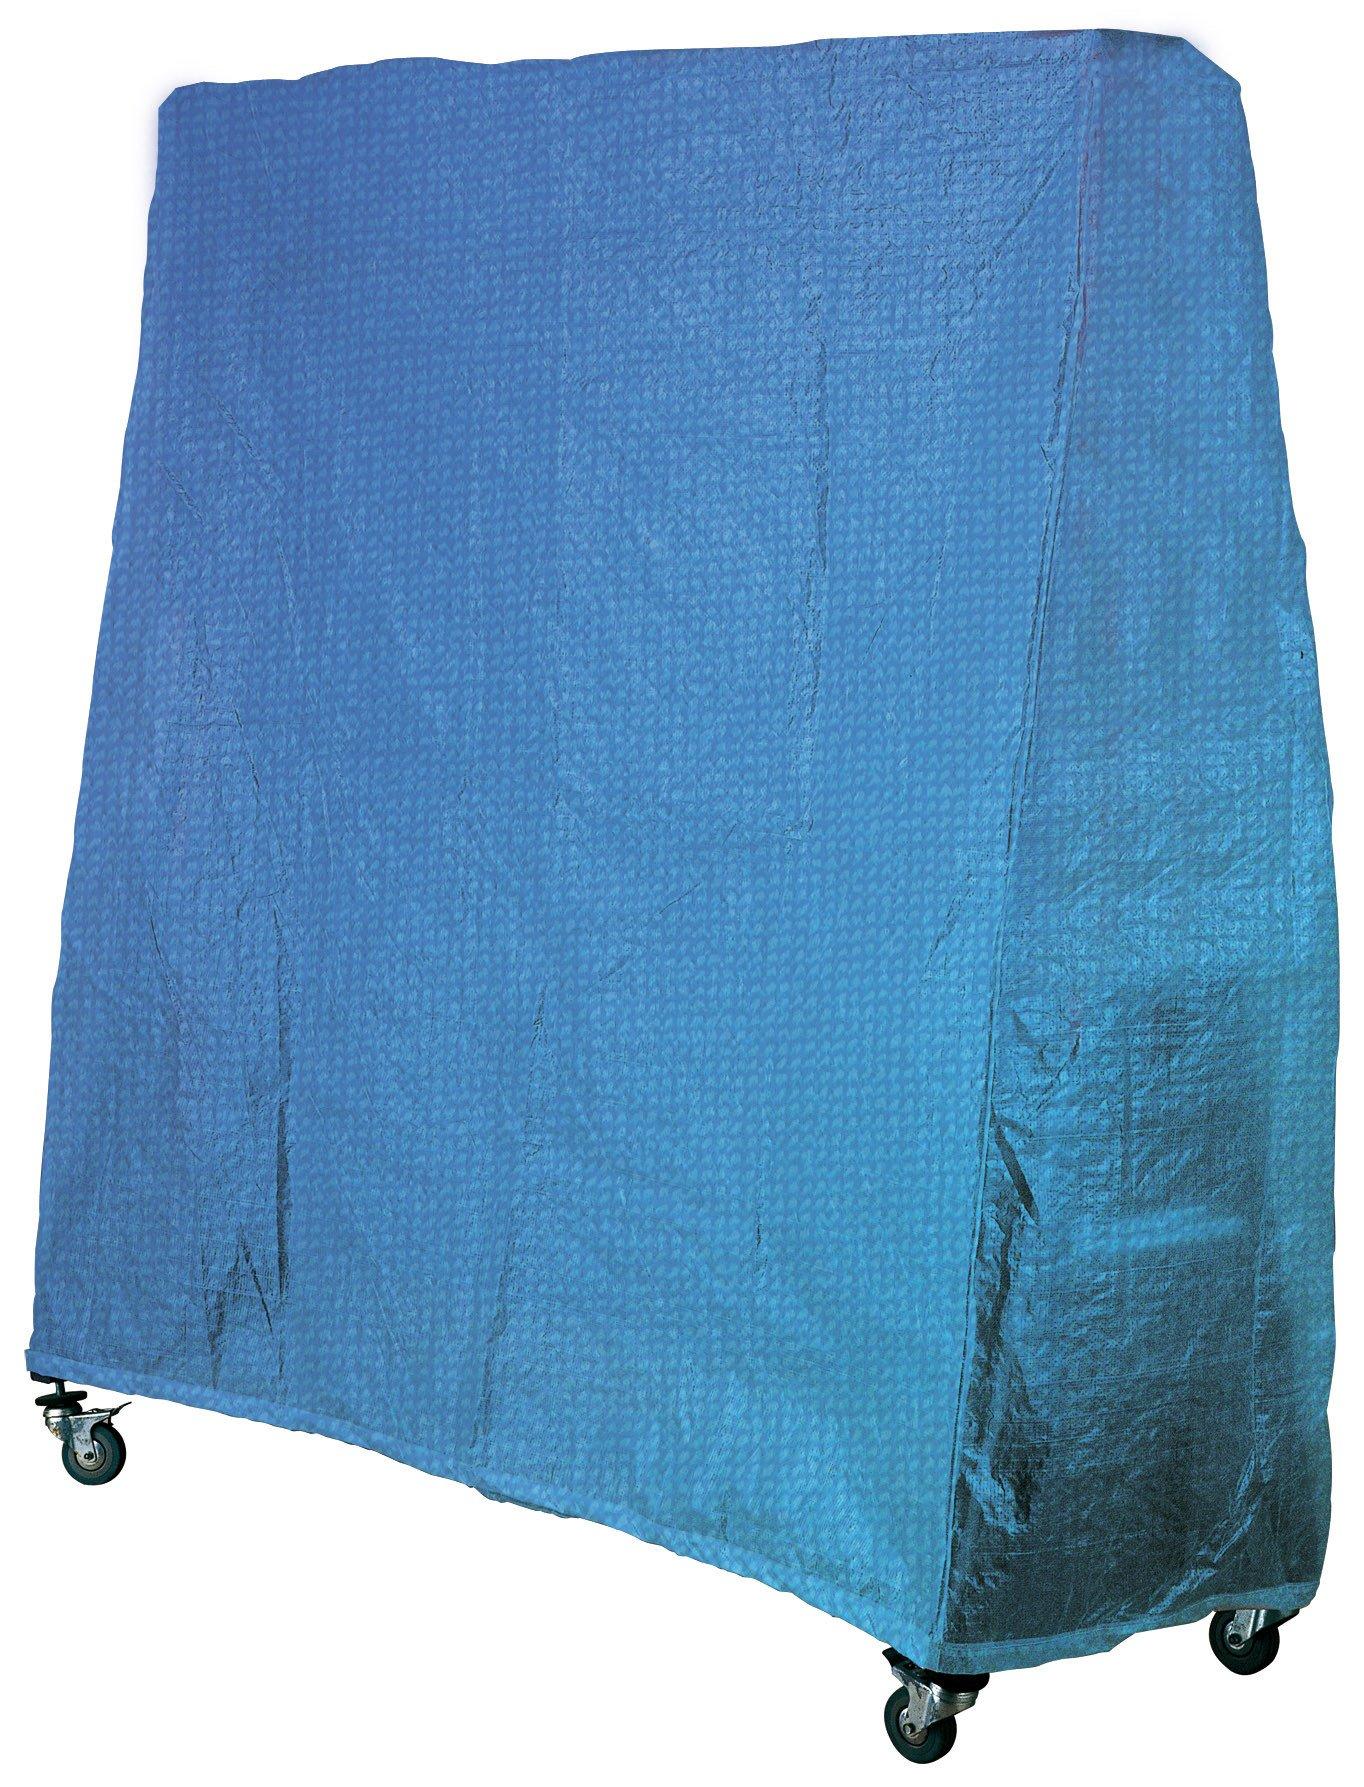 Garlando Waterproof Indoor/Outdoor Table Tennis Table Cover